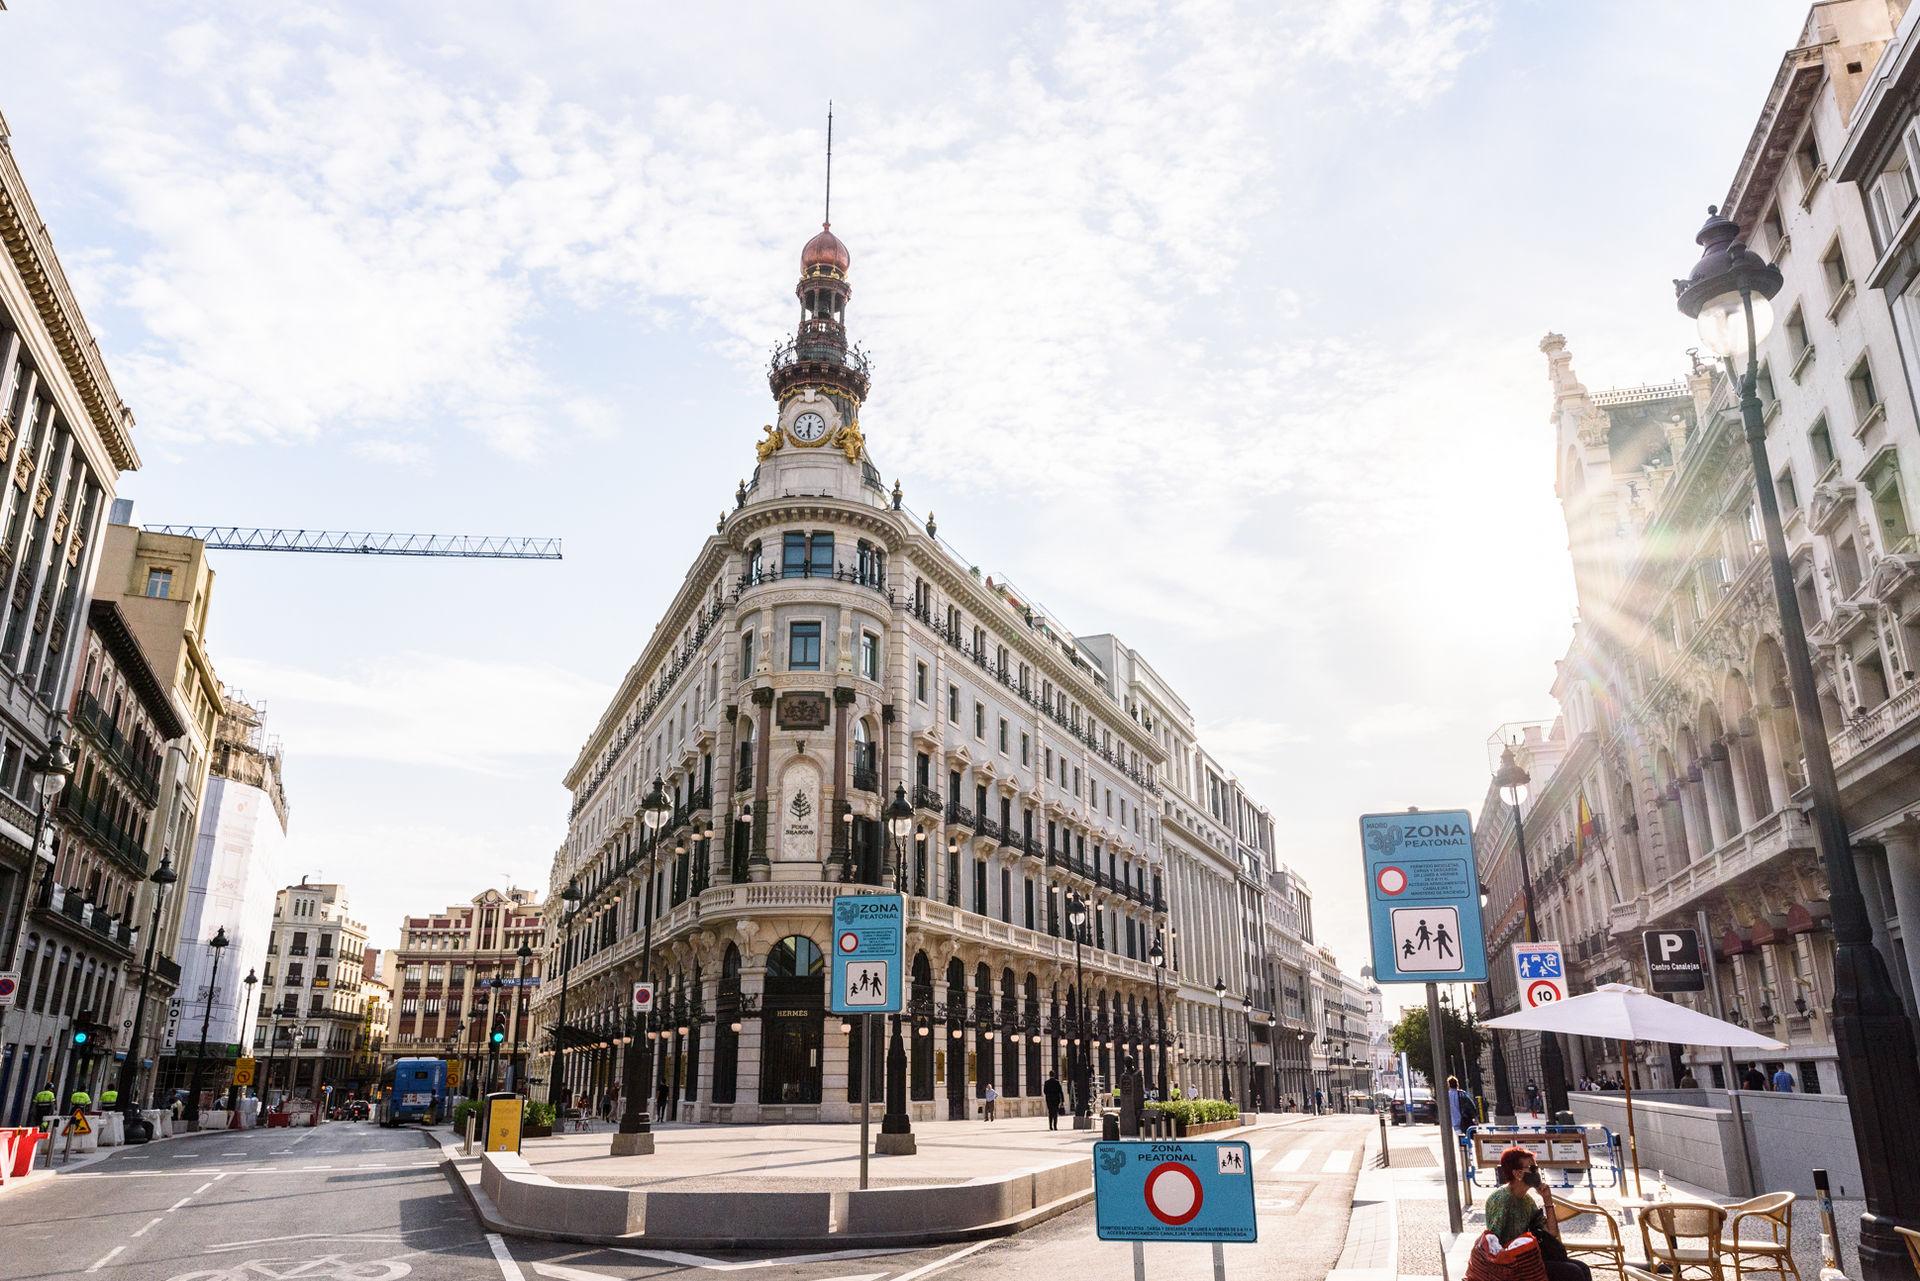 edificio-canalejas-four-seasons-hotel-madrid-00005.jpg